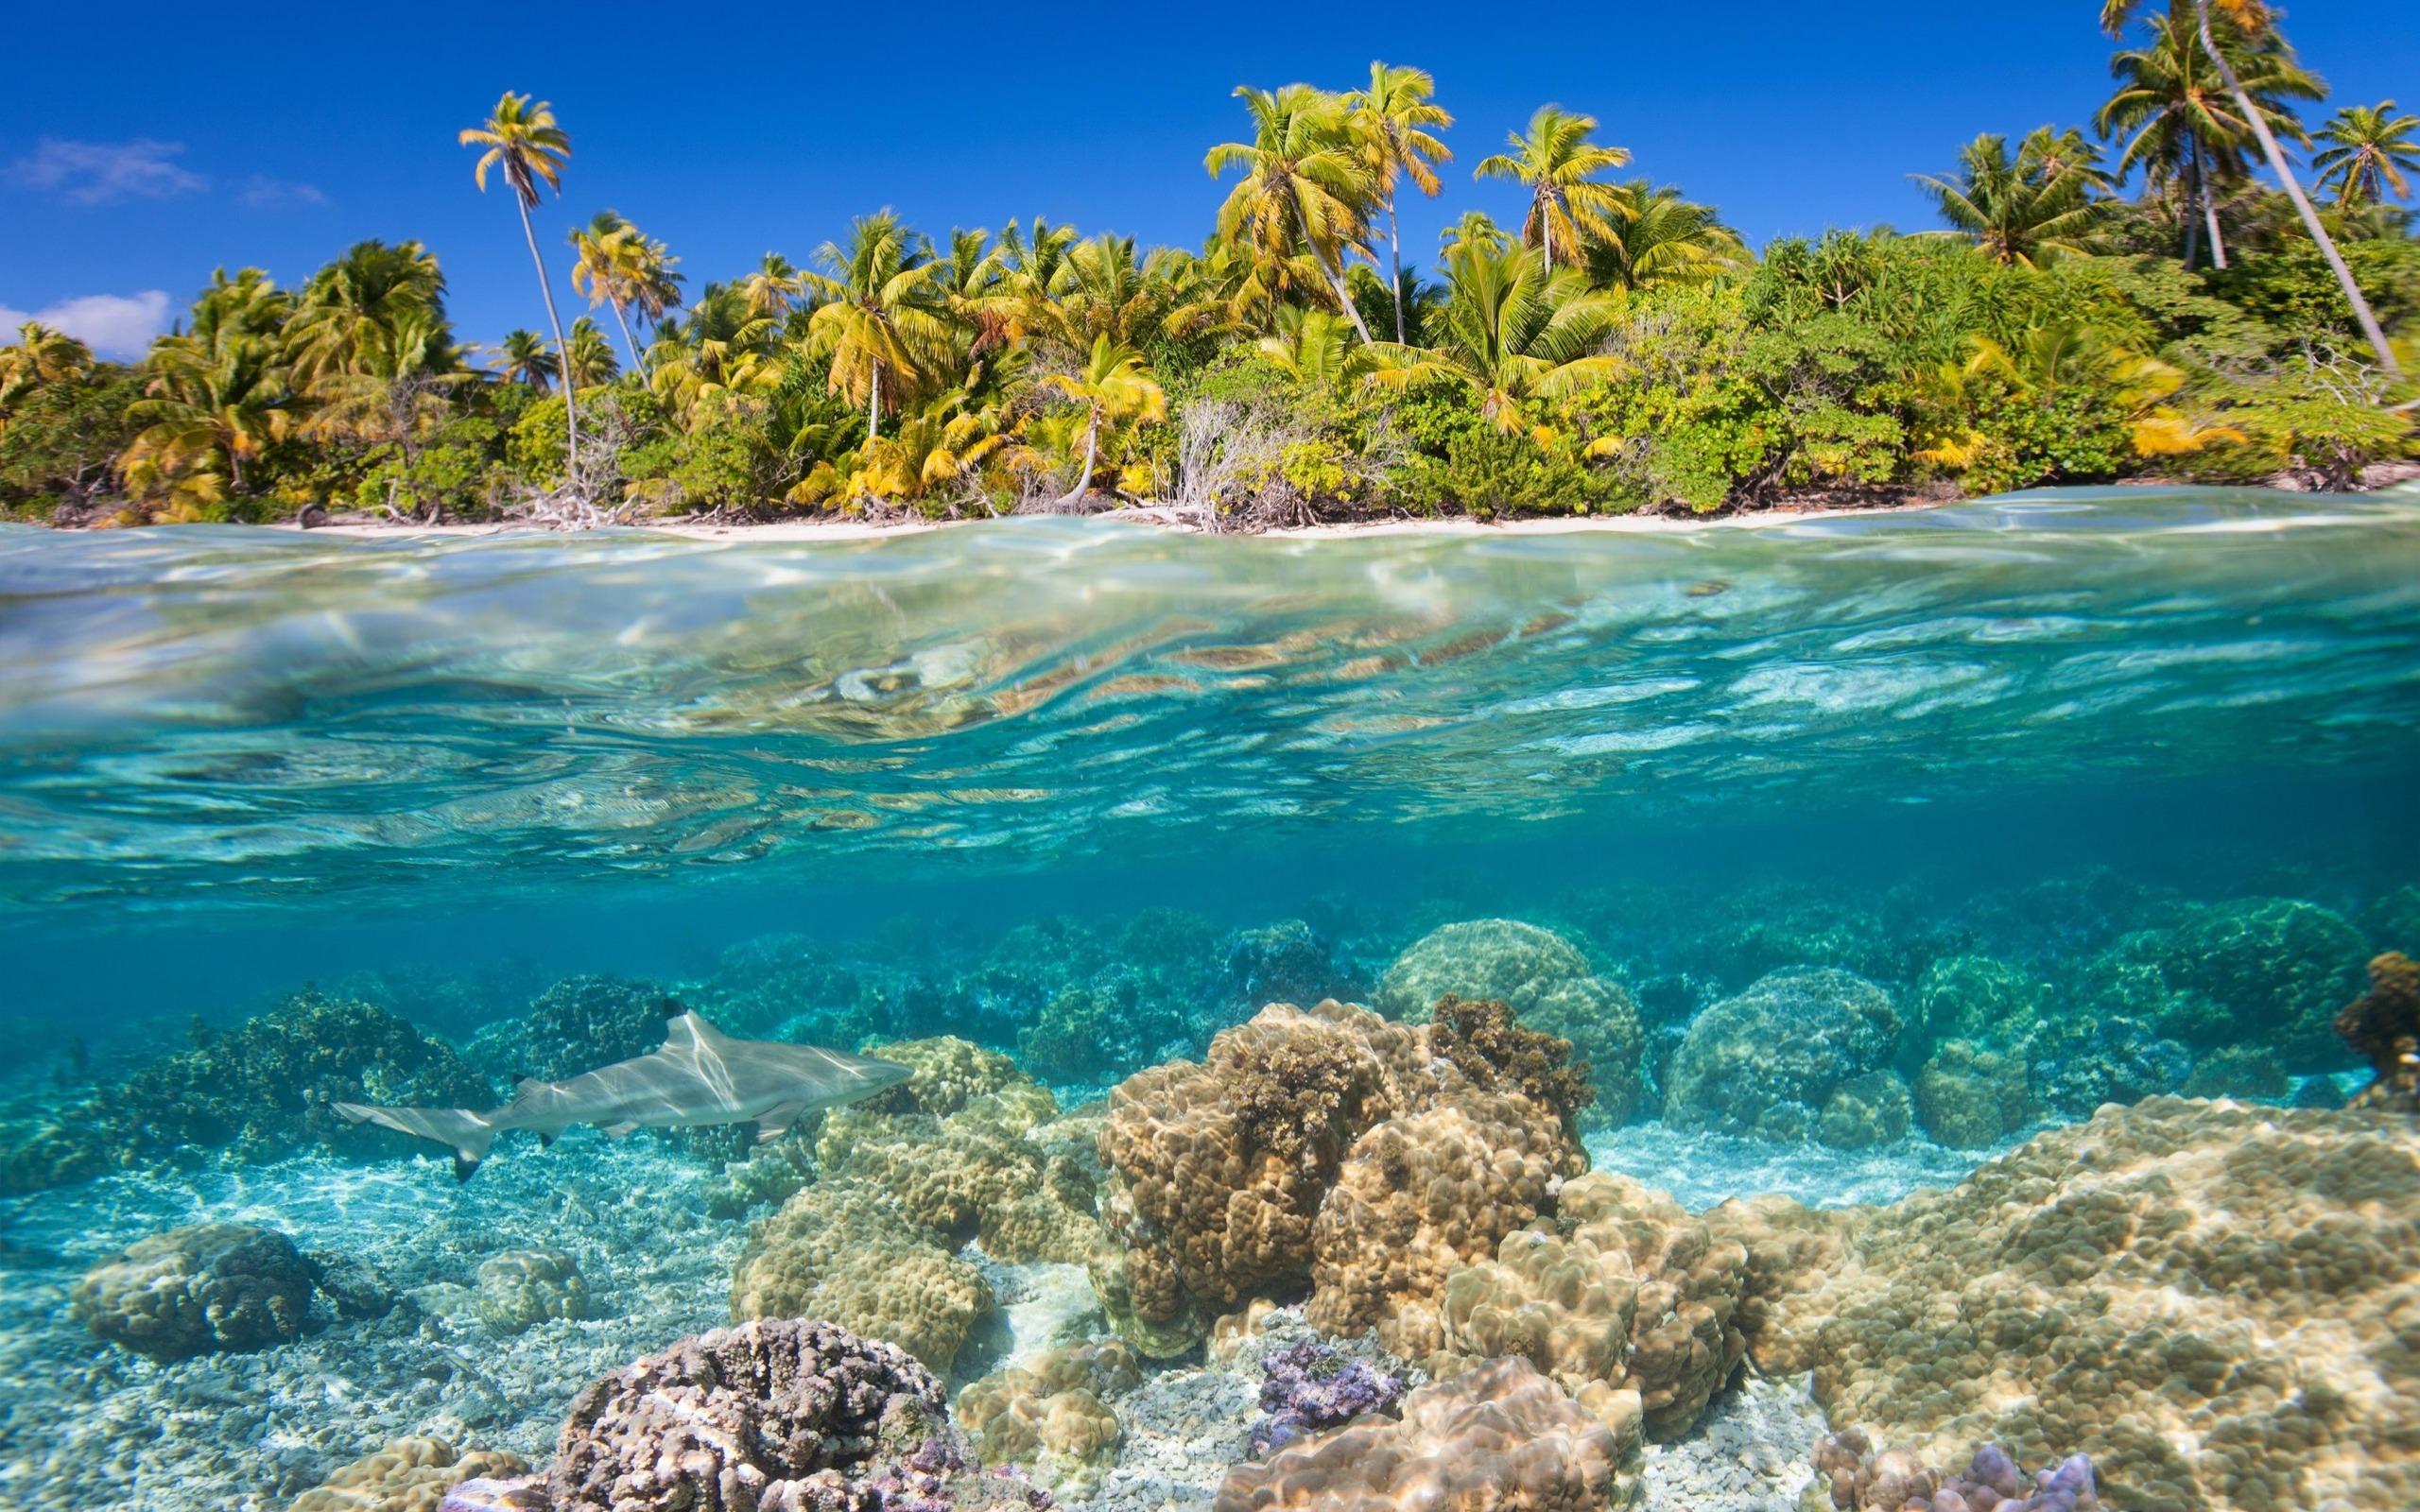 Tropical Islands, Underwater World, Corals, Shark, - Beach Underwater High Resolution , HD Wallpaper & Backgrounds